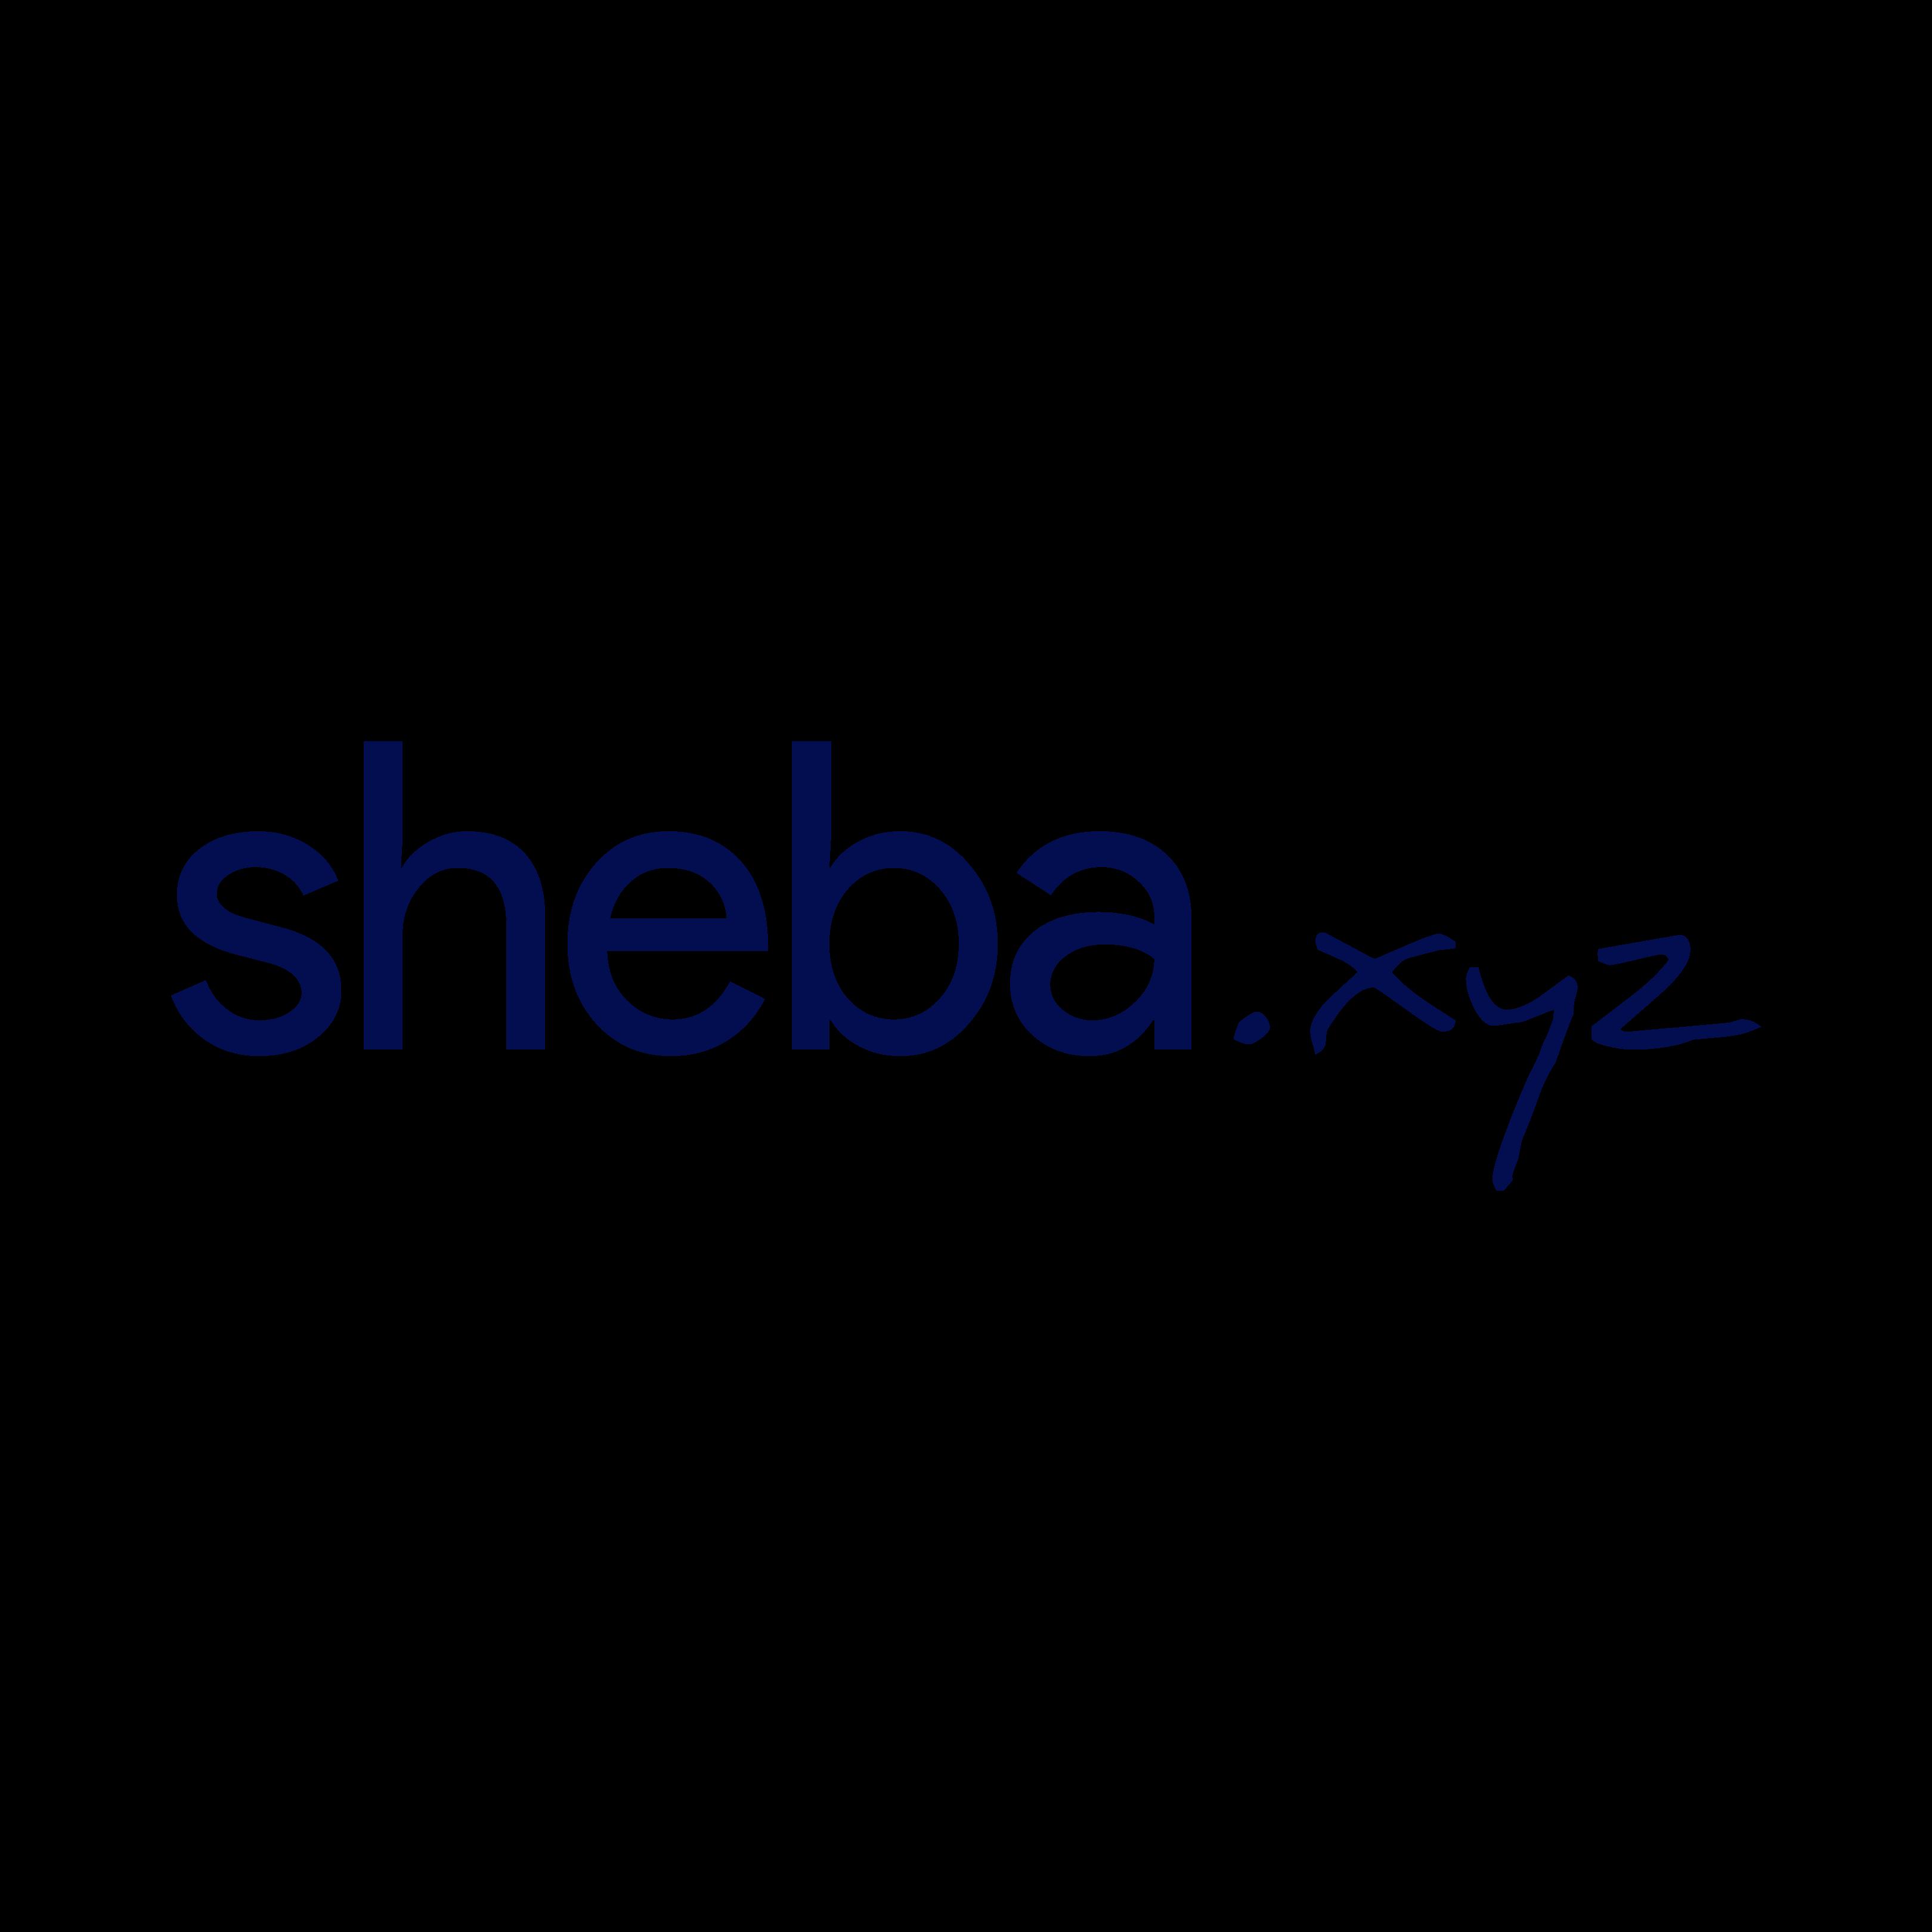 https://assets.roar.media/assets/6vtP4hMXXv0RQRW6_Sheba-Logo.png